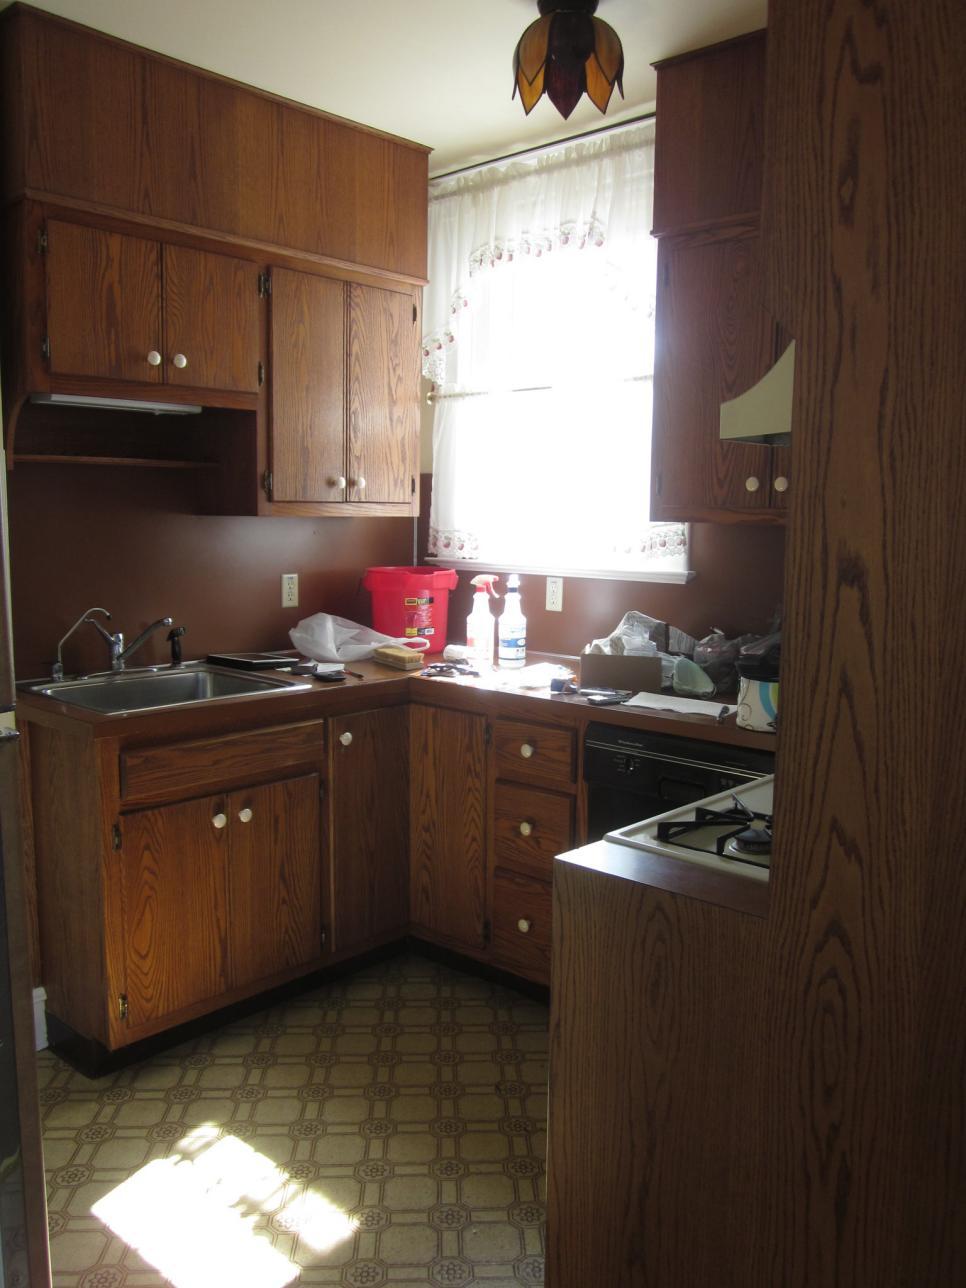 original-christinas-adventures_kitchens-under-5000-before-jpg-rend-hgtvcom-966-1288